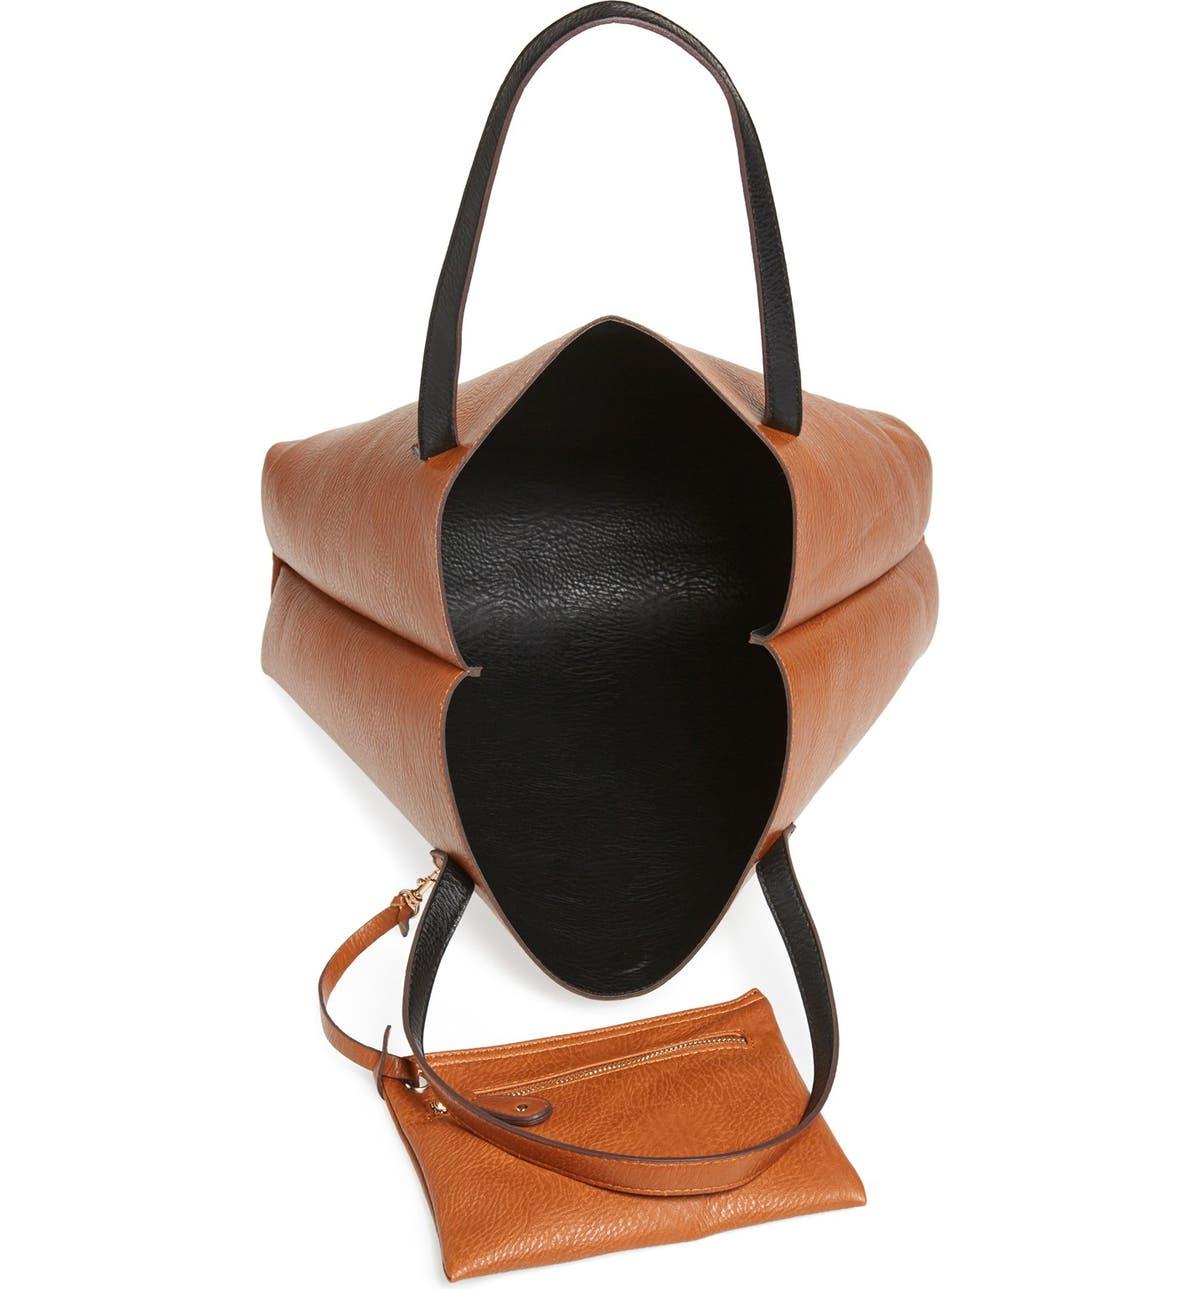 fe172fd8e5 Street Level Reversible Faux Leather Tote   Wristlet